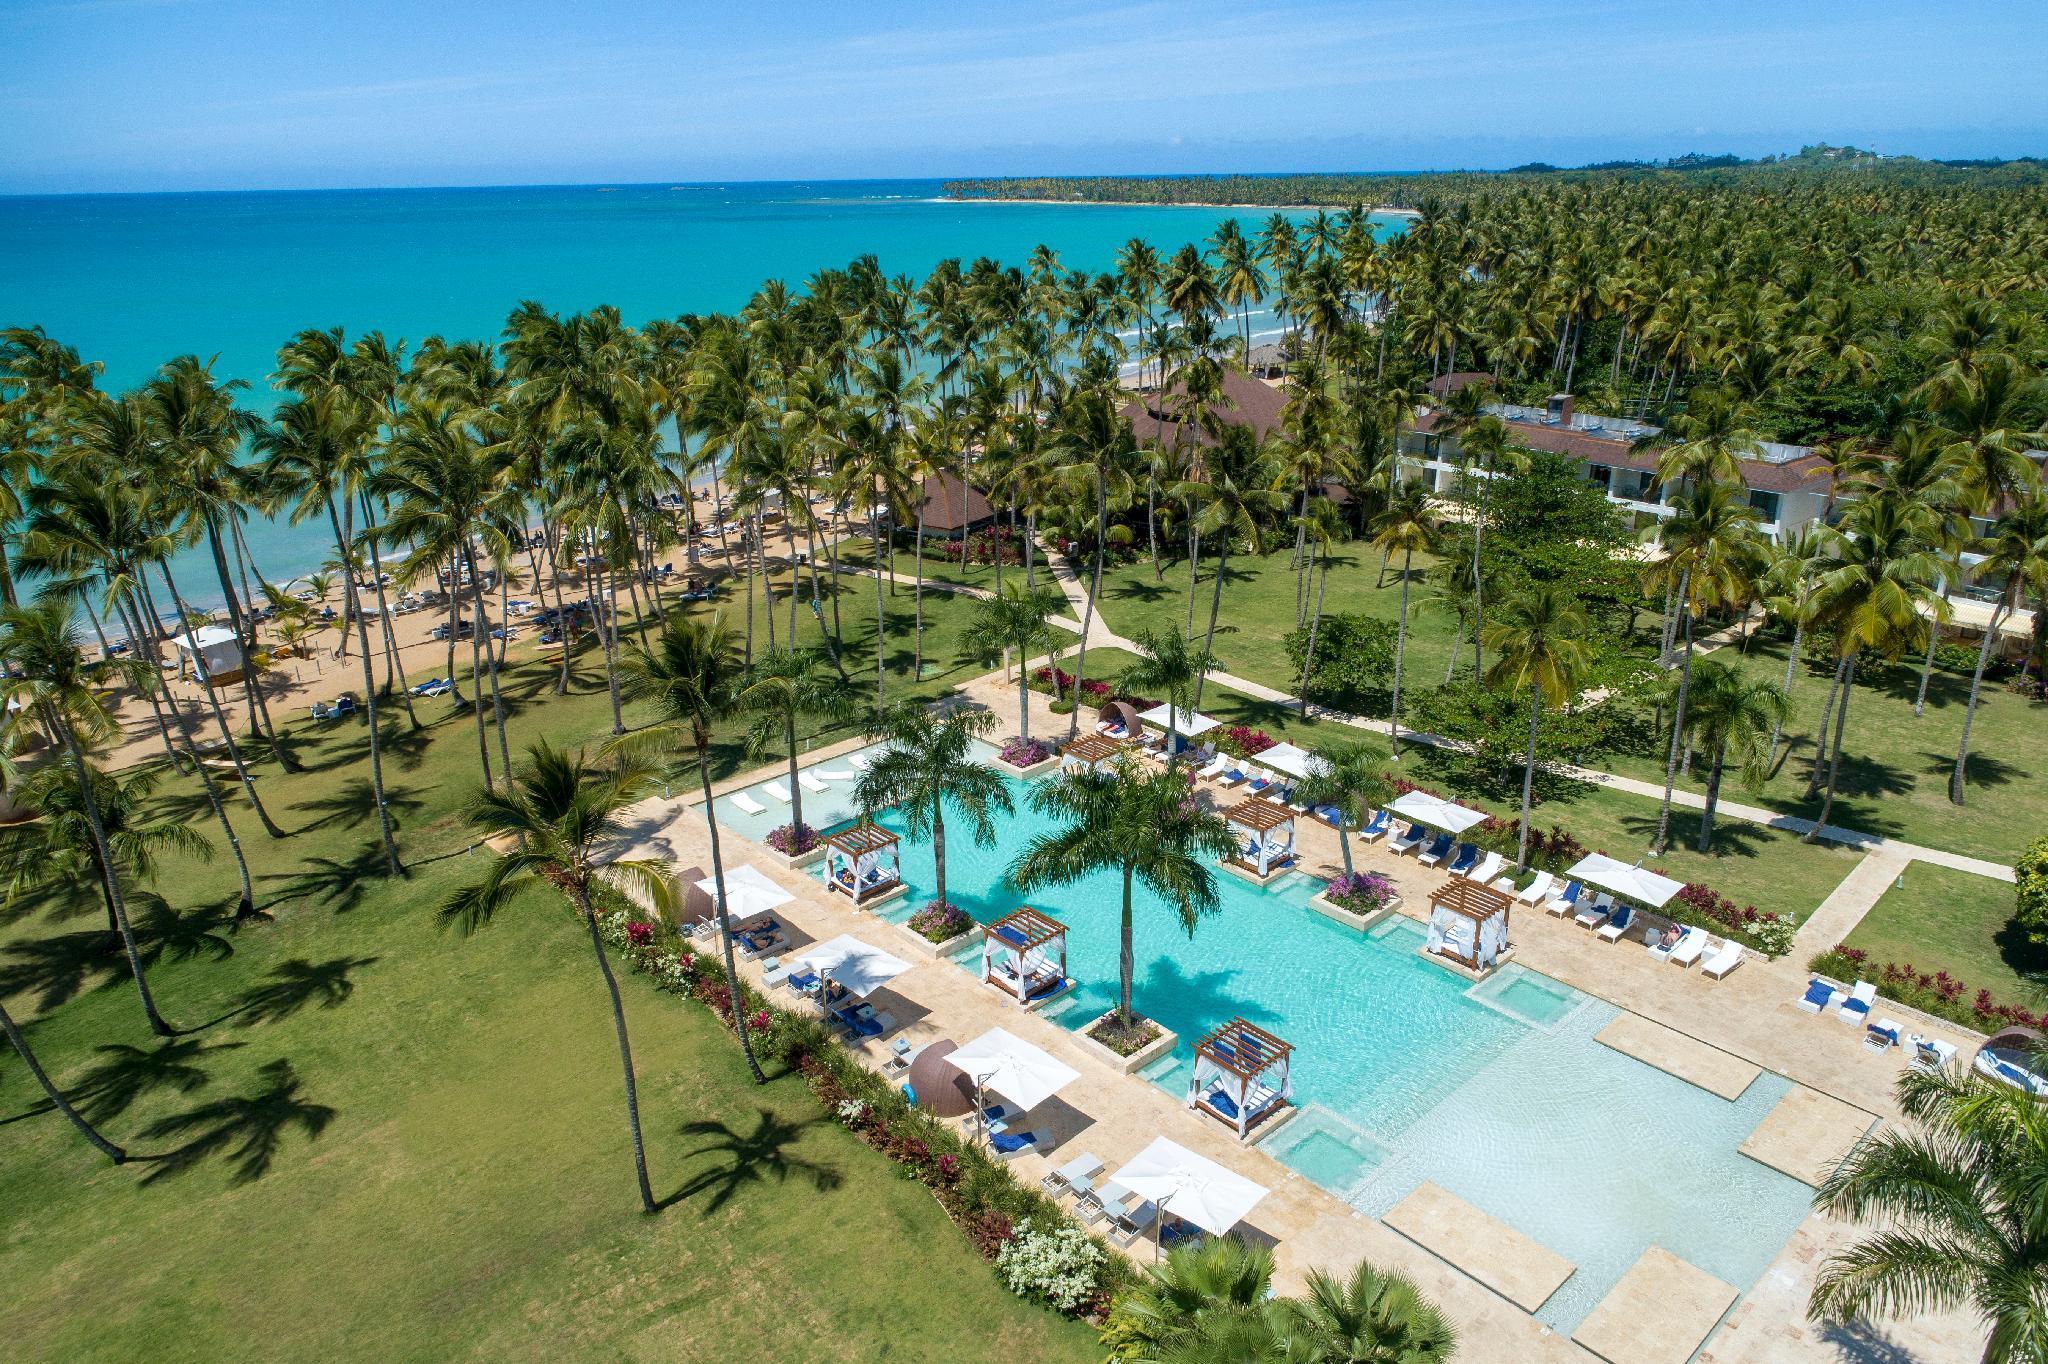 Viva Wyndham V Samana - All-Inclusive Resort, Adults Only